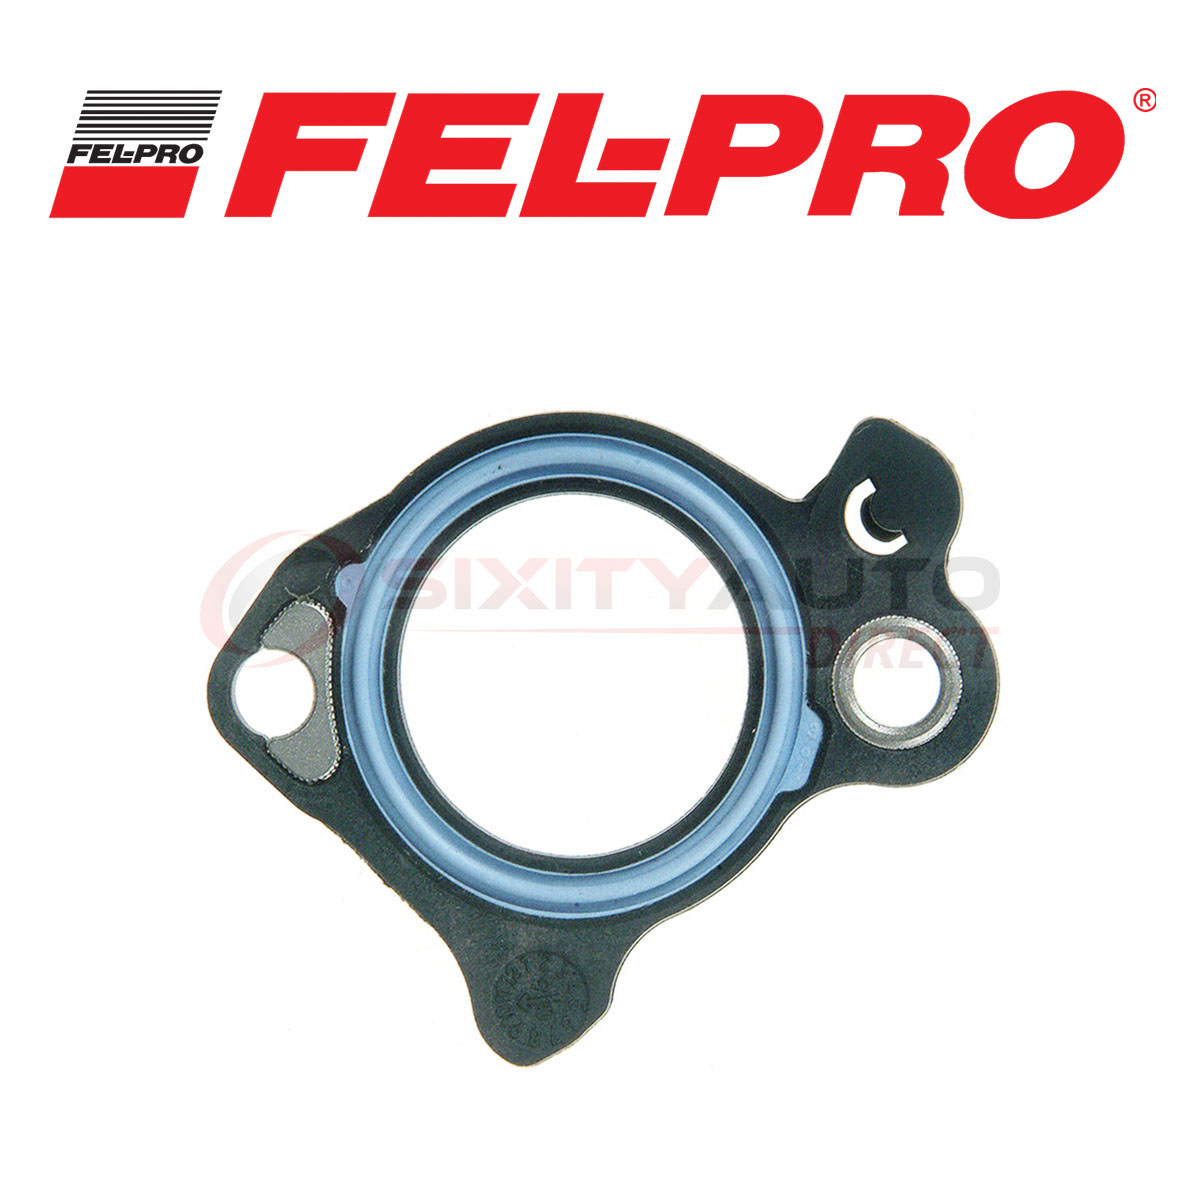 Engine Coolant Crossover Pipe Gasket Left FEL-PRO 35958